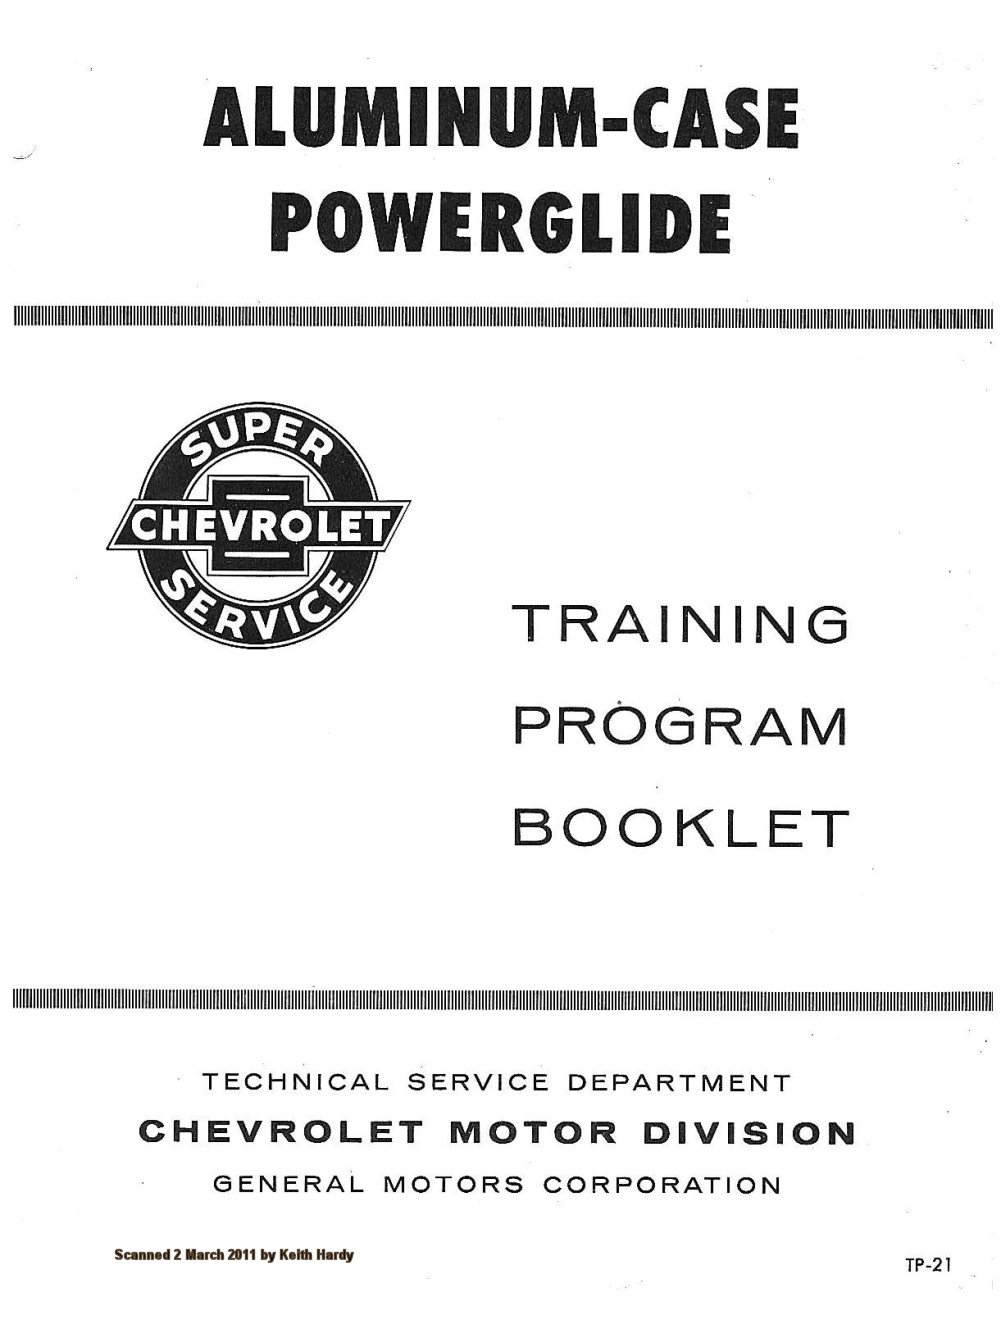 1962 Chevrolet ALUMINUM-CASE POWERGLIDE Training Program Booklet TP-21